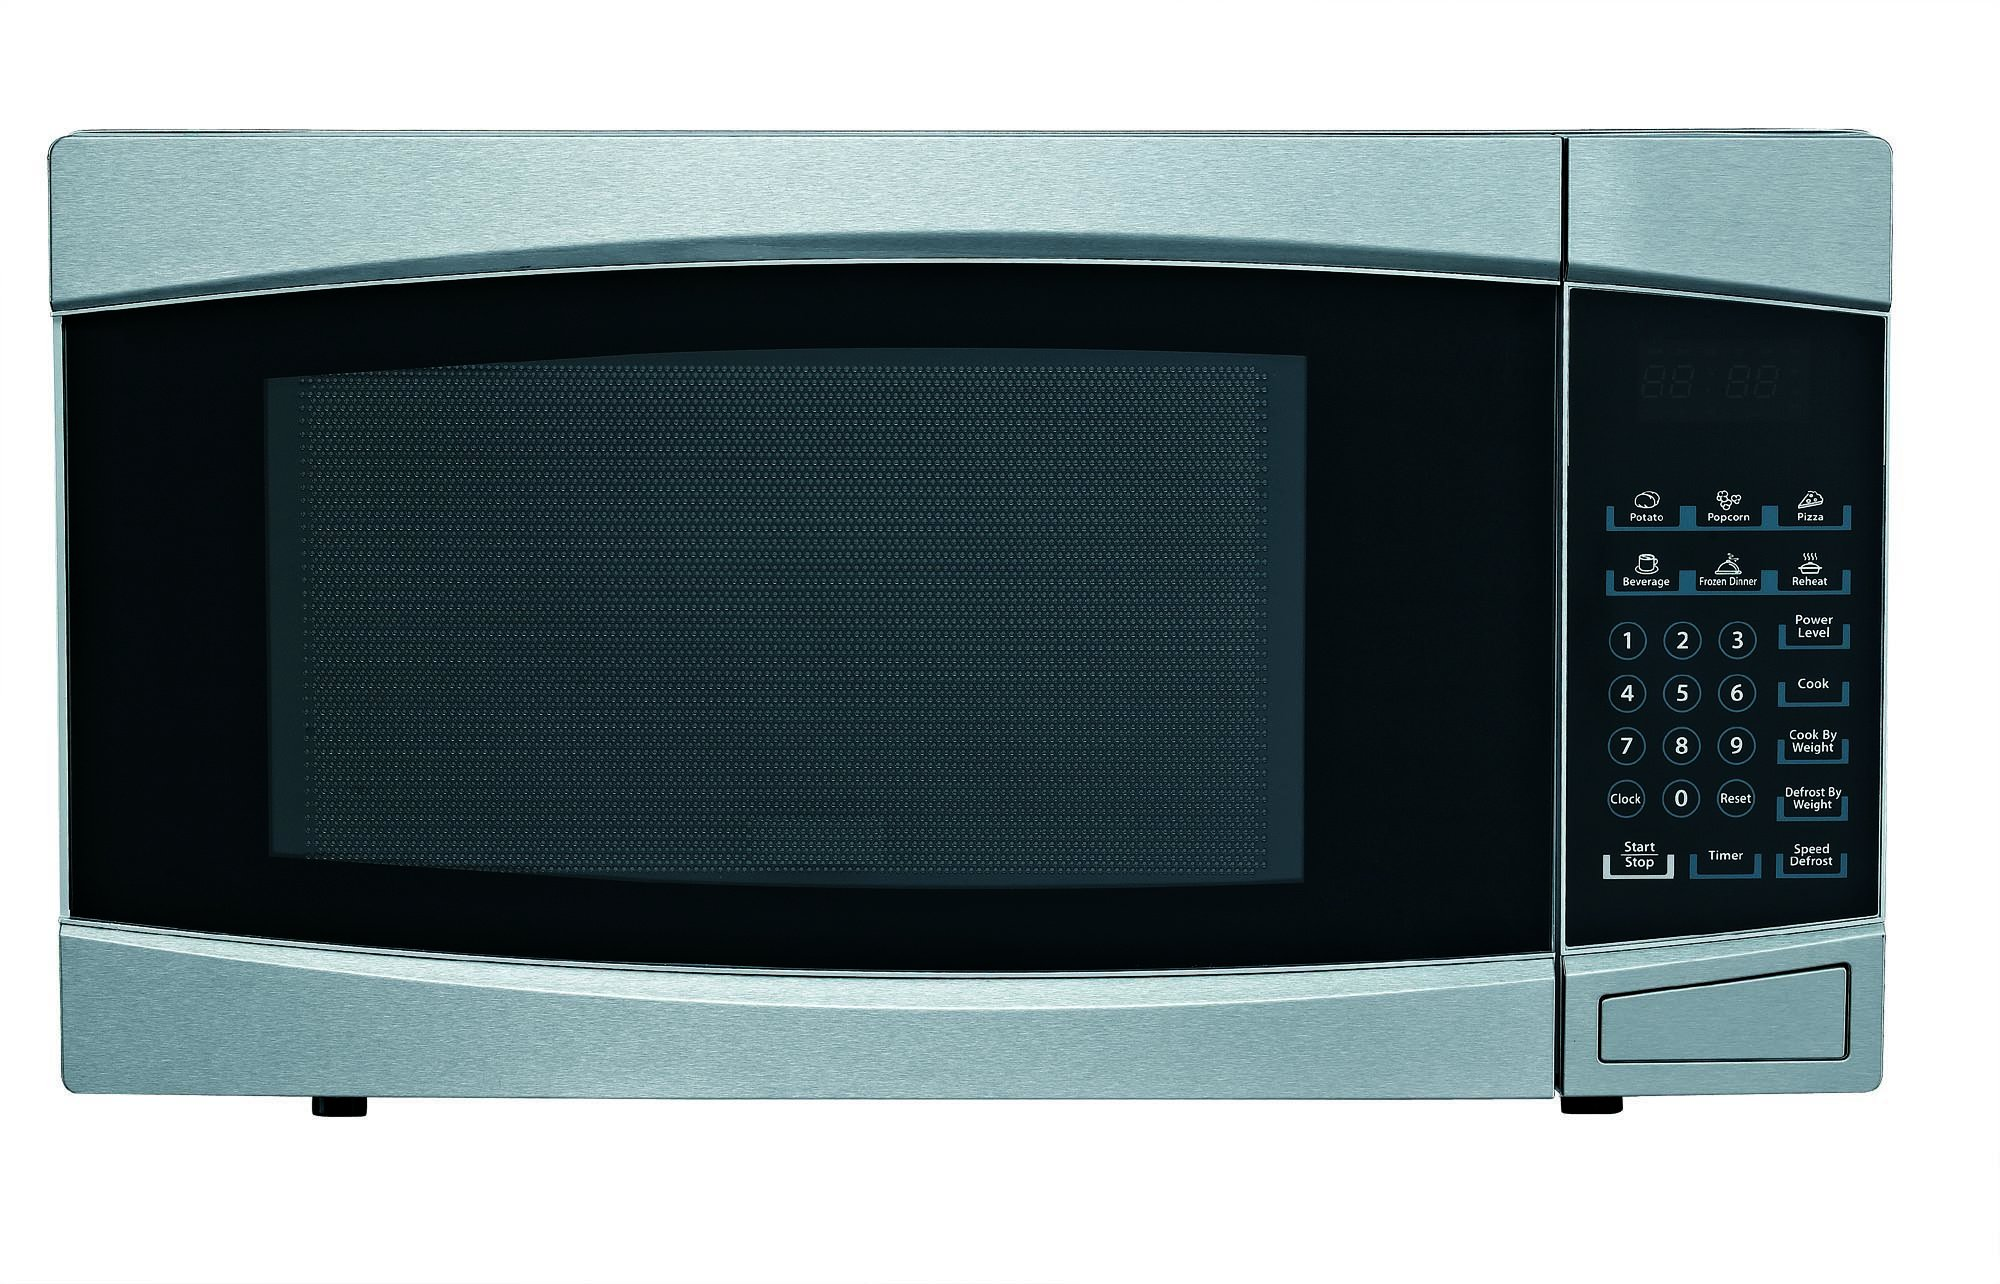 RCA RMW1414 Stainless Steel Microwave, 1.4 cu. ft., Black